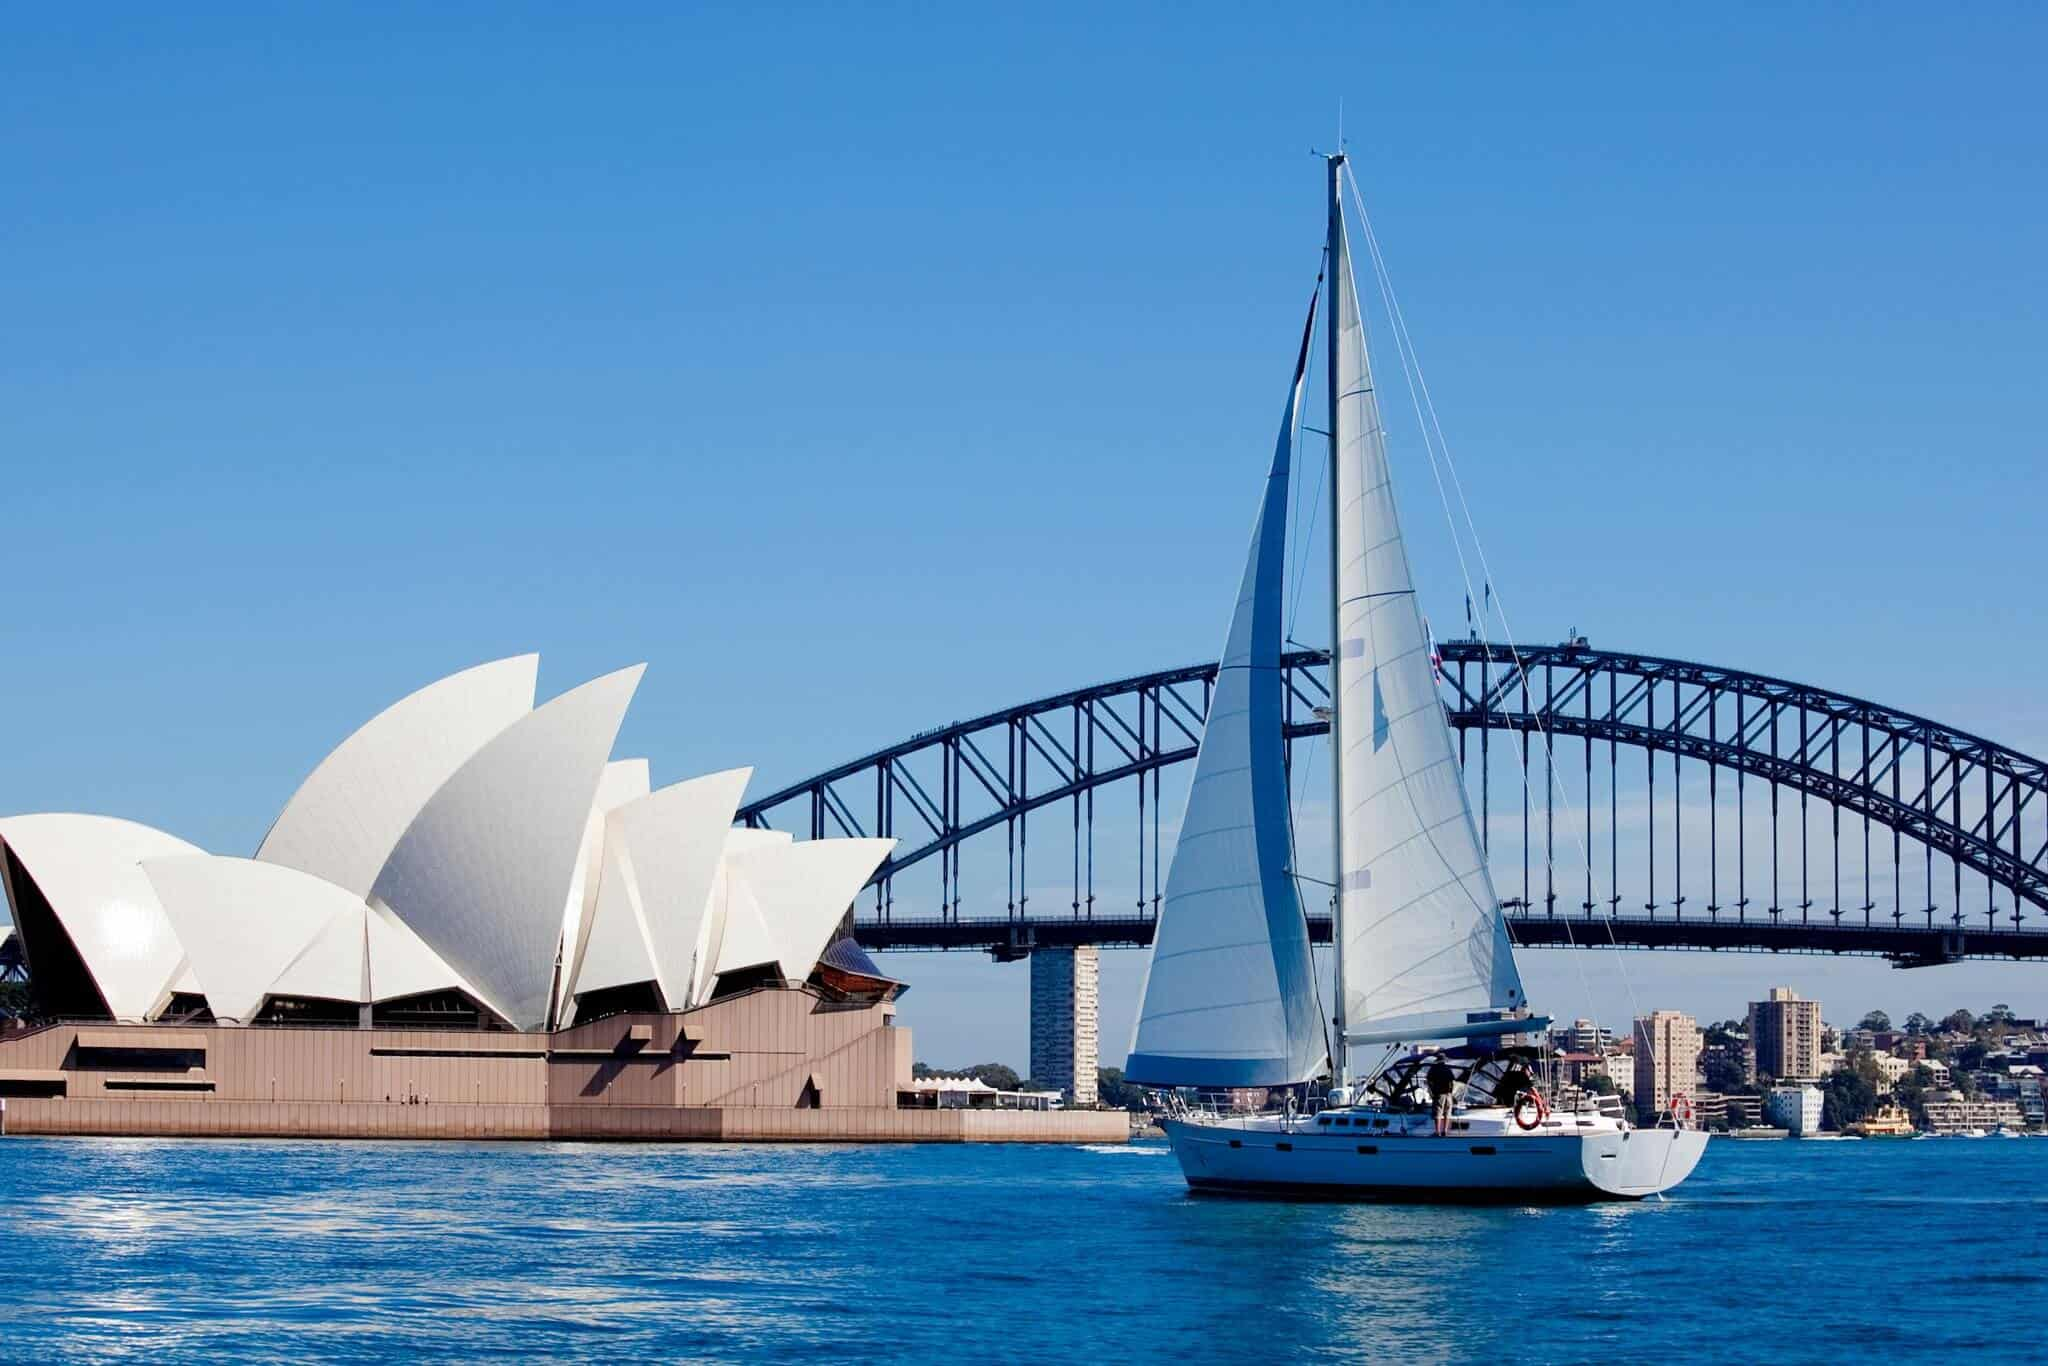 Sydney-sydney-new-south-whales-australia-32662736-2048-1366